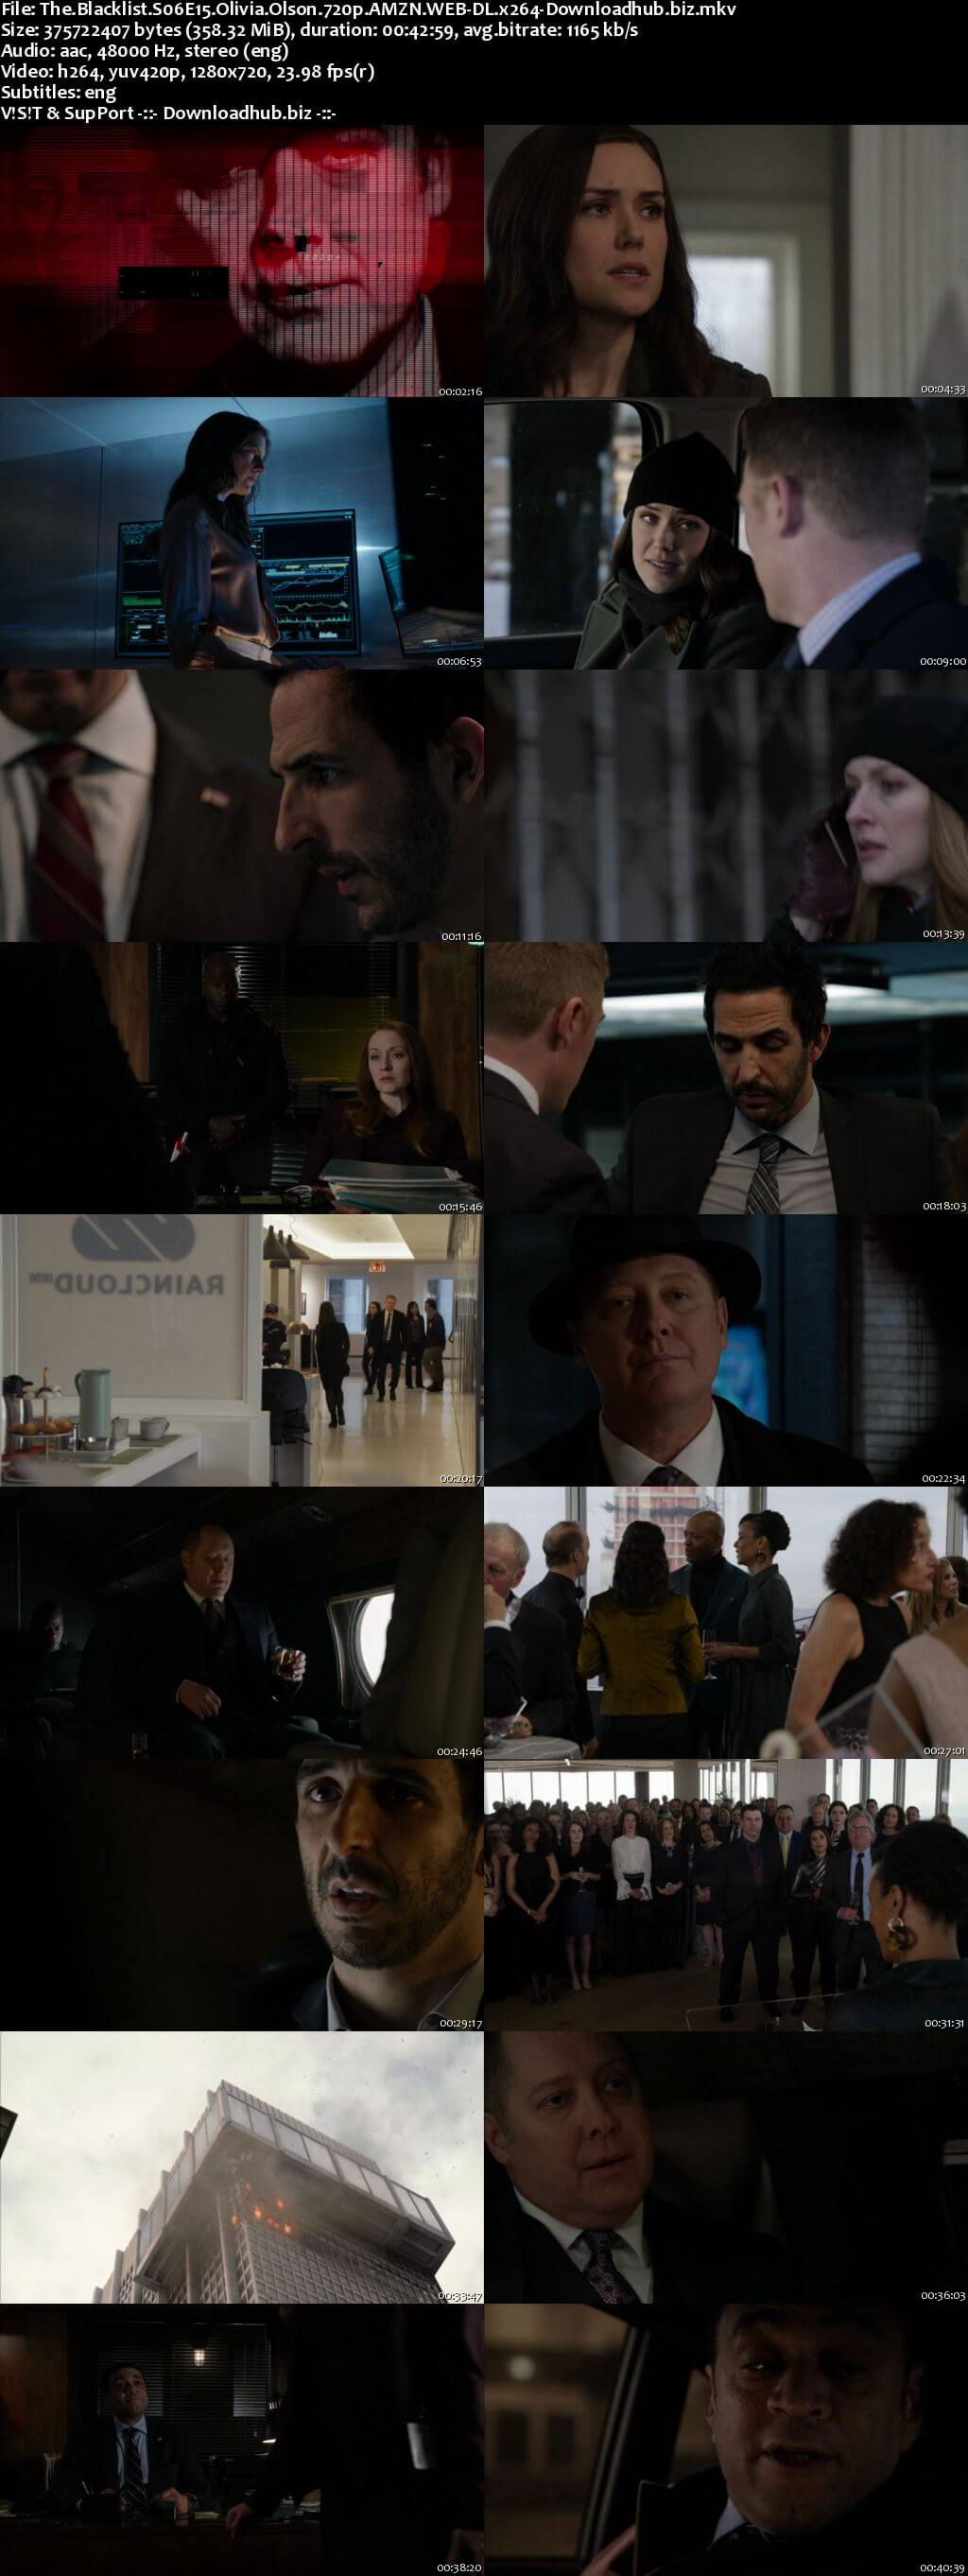 The Blacklist S06E15 350MB AMZN WEB-DL 720p ESubs